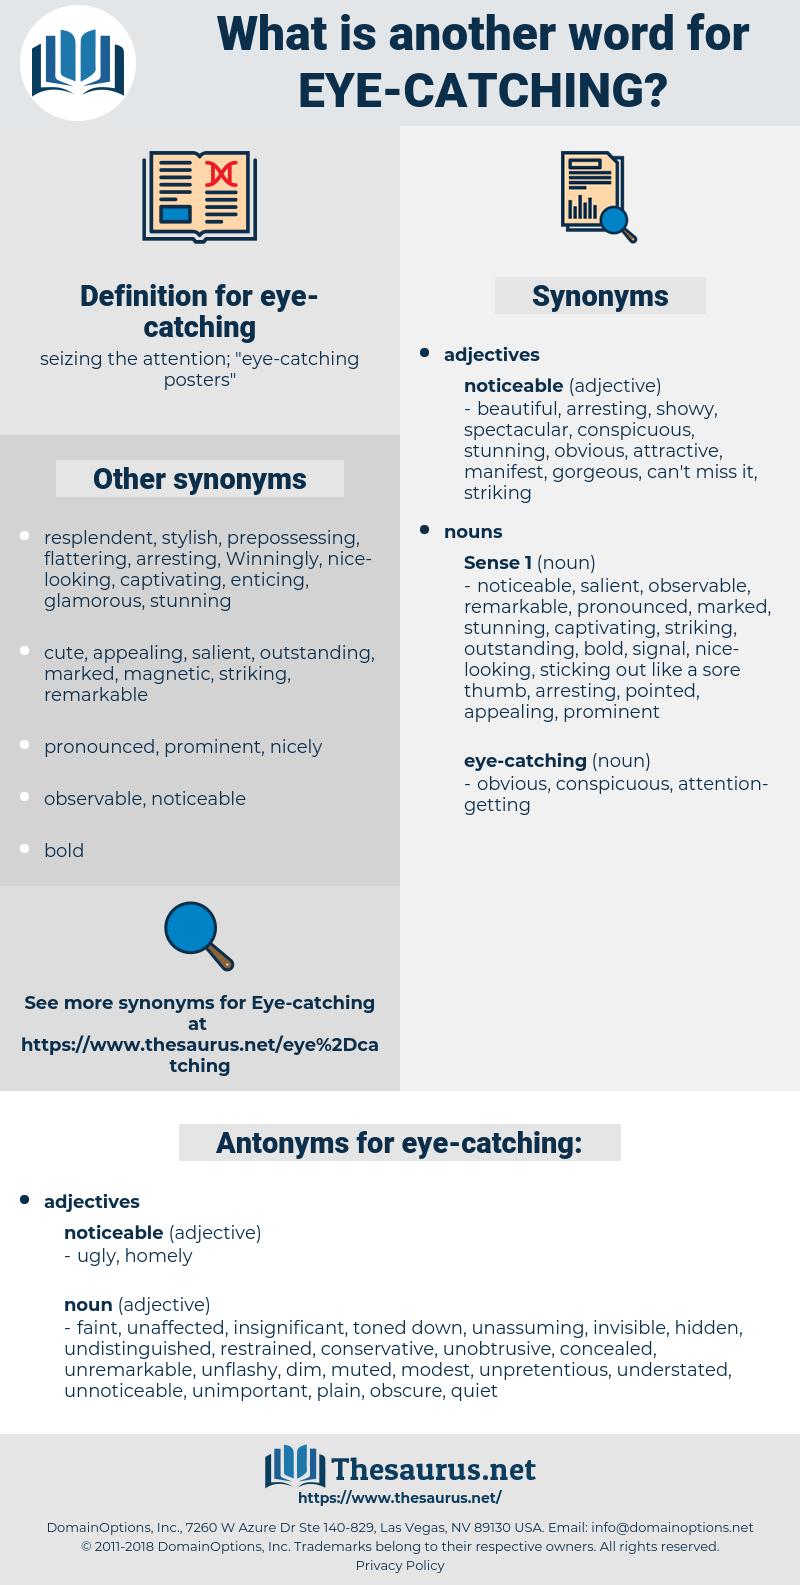 eye catching, synonym eye catching, another word for eye catching, words like eye catching, thesaurus eye catching